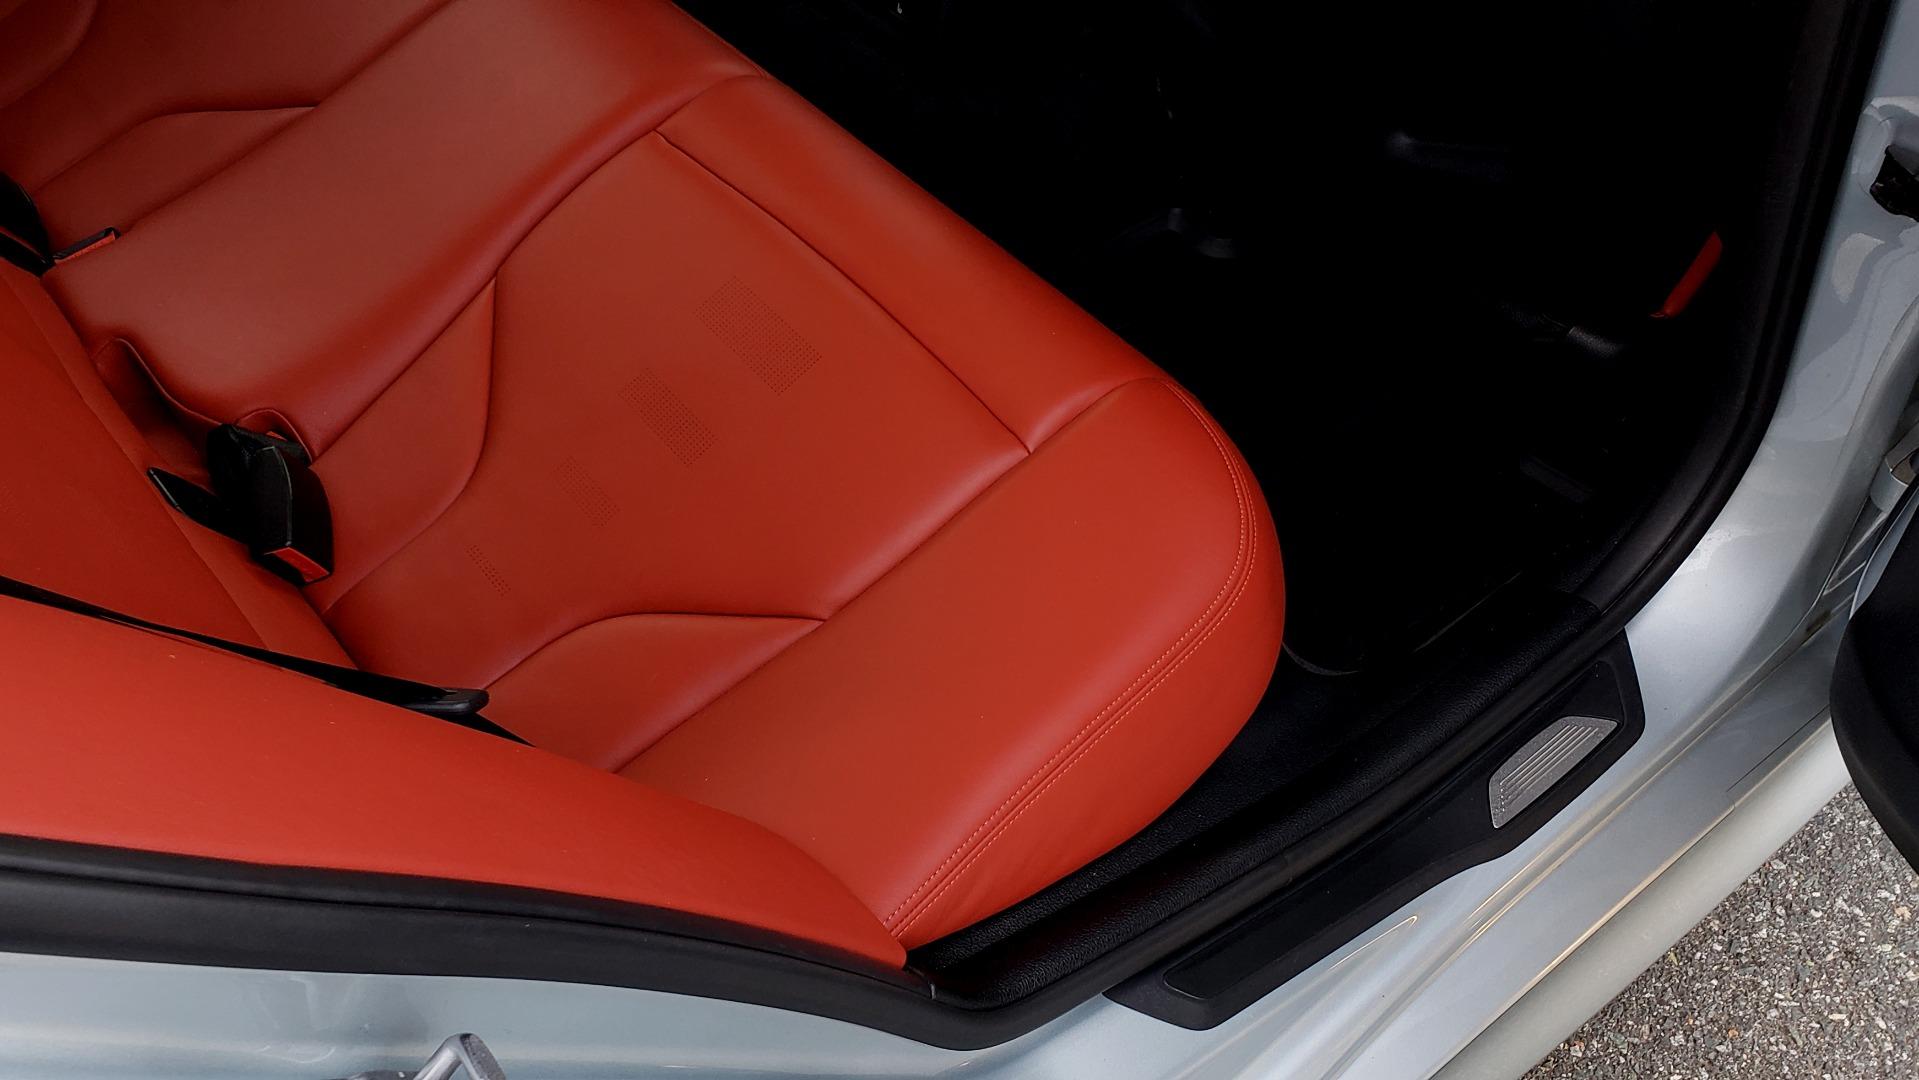 Used 2015 BMW M3 EXECUTIVE PKG / NAV / CAMERA / HUD / CARBON FIBER ROOF for sale Sold at Formula Imports in Charlotte NC 28227 83